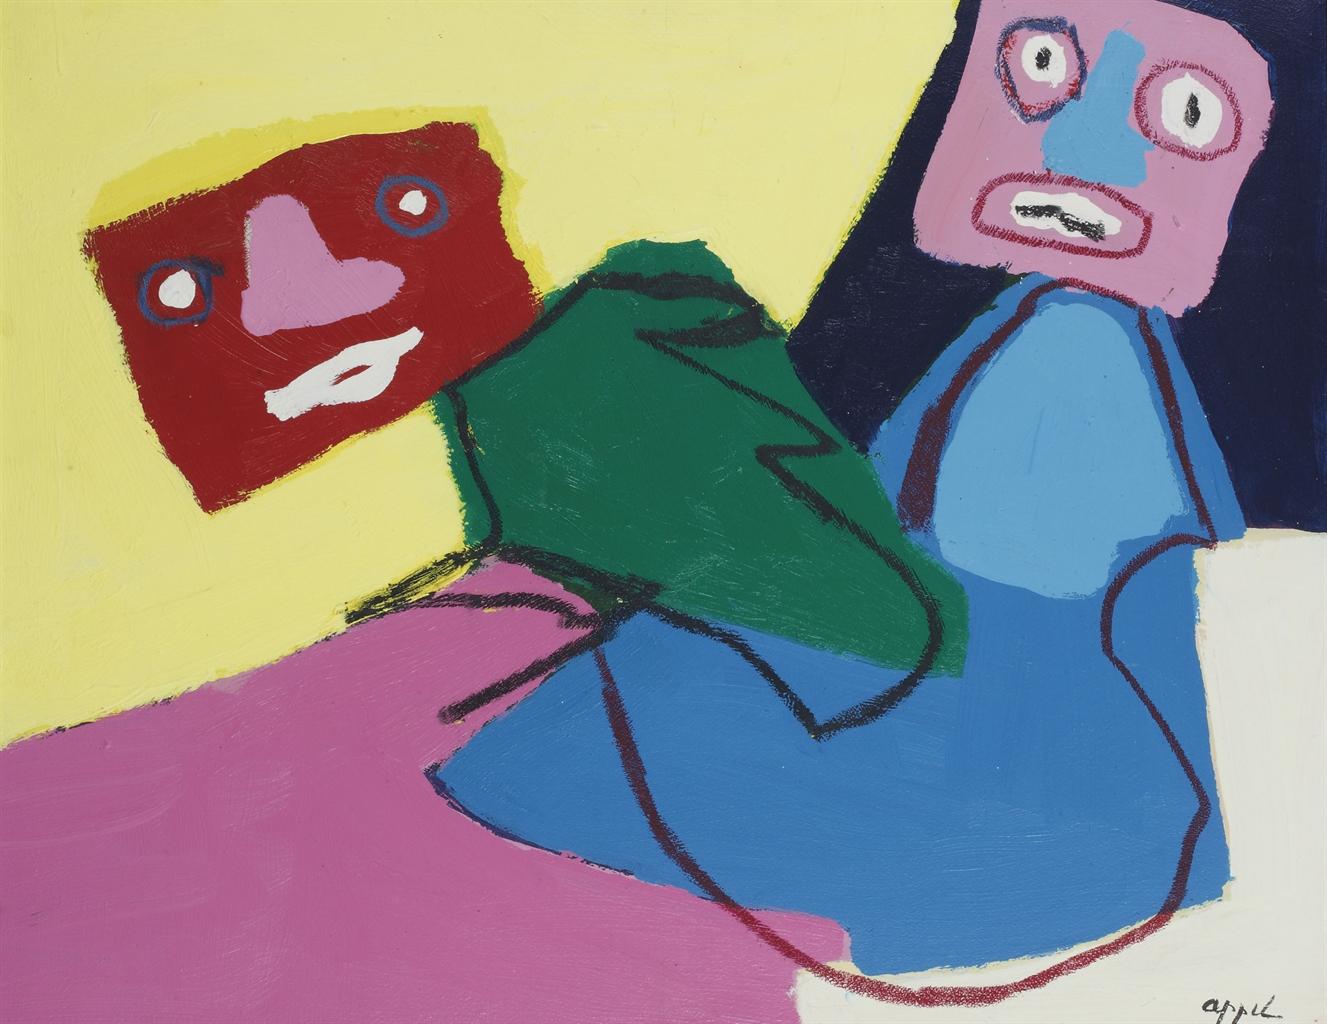 Karel Appel-Looking No. 19-1969